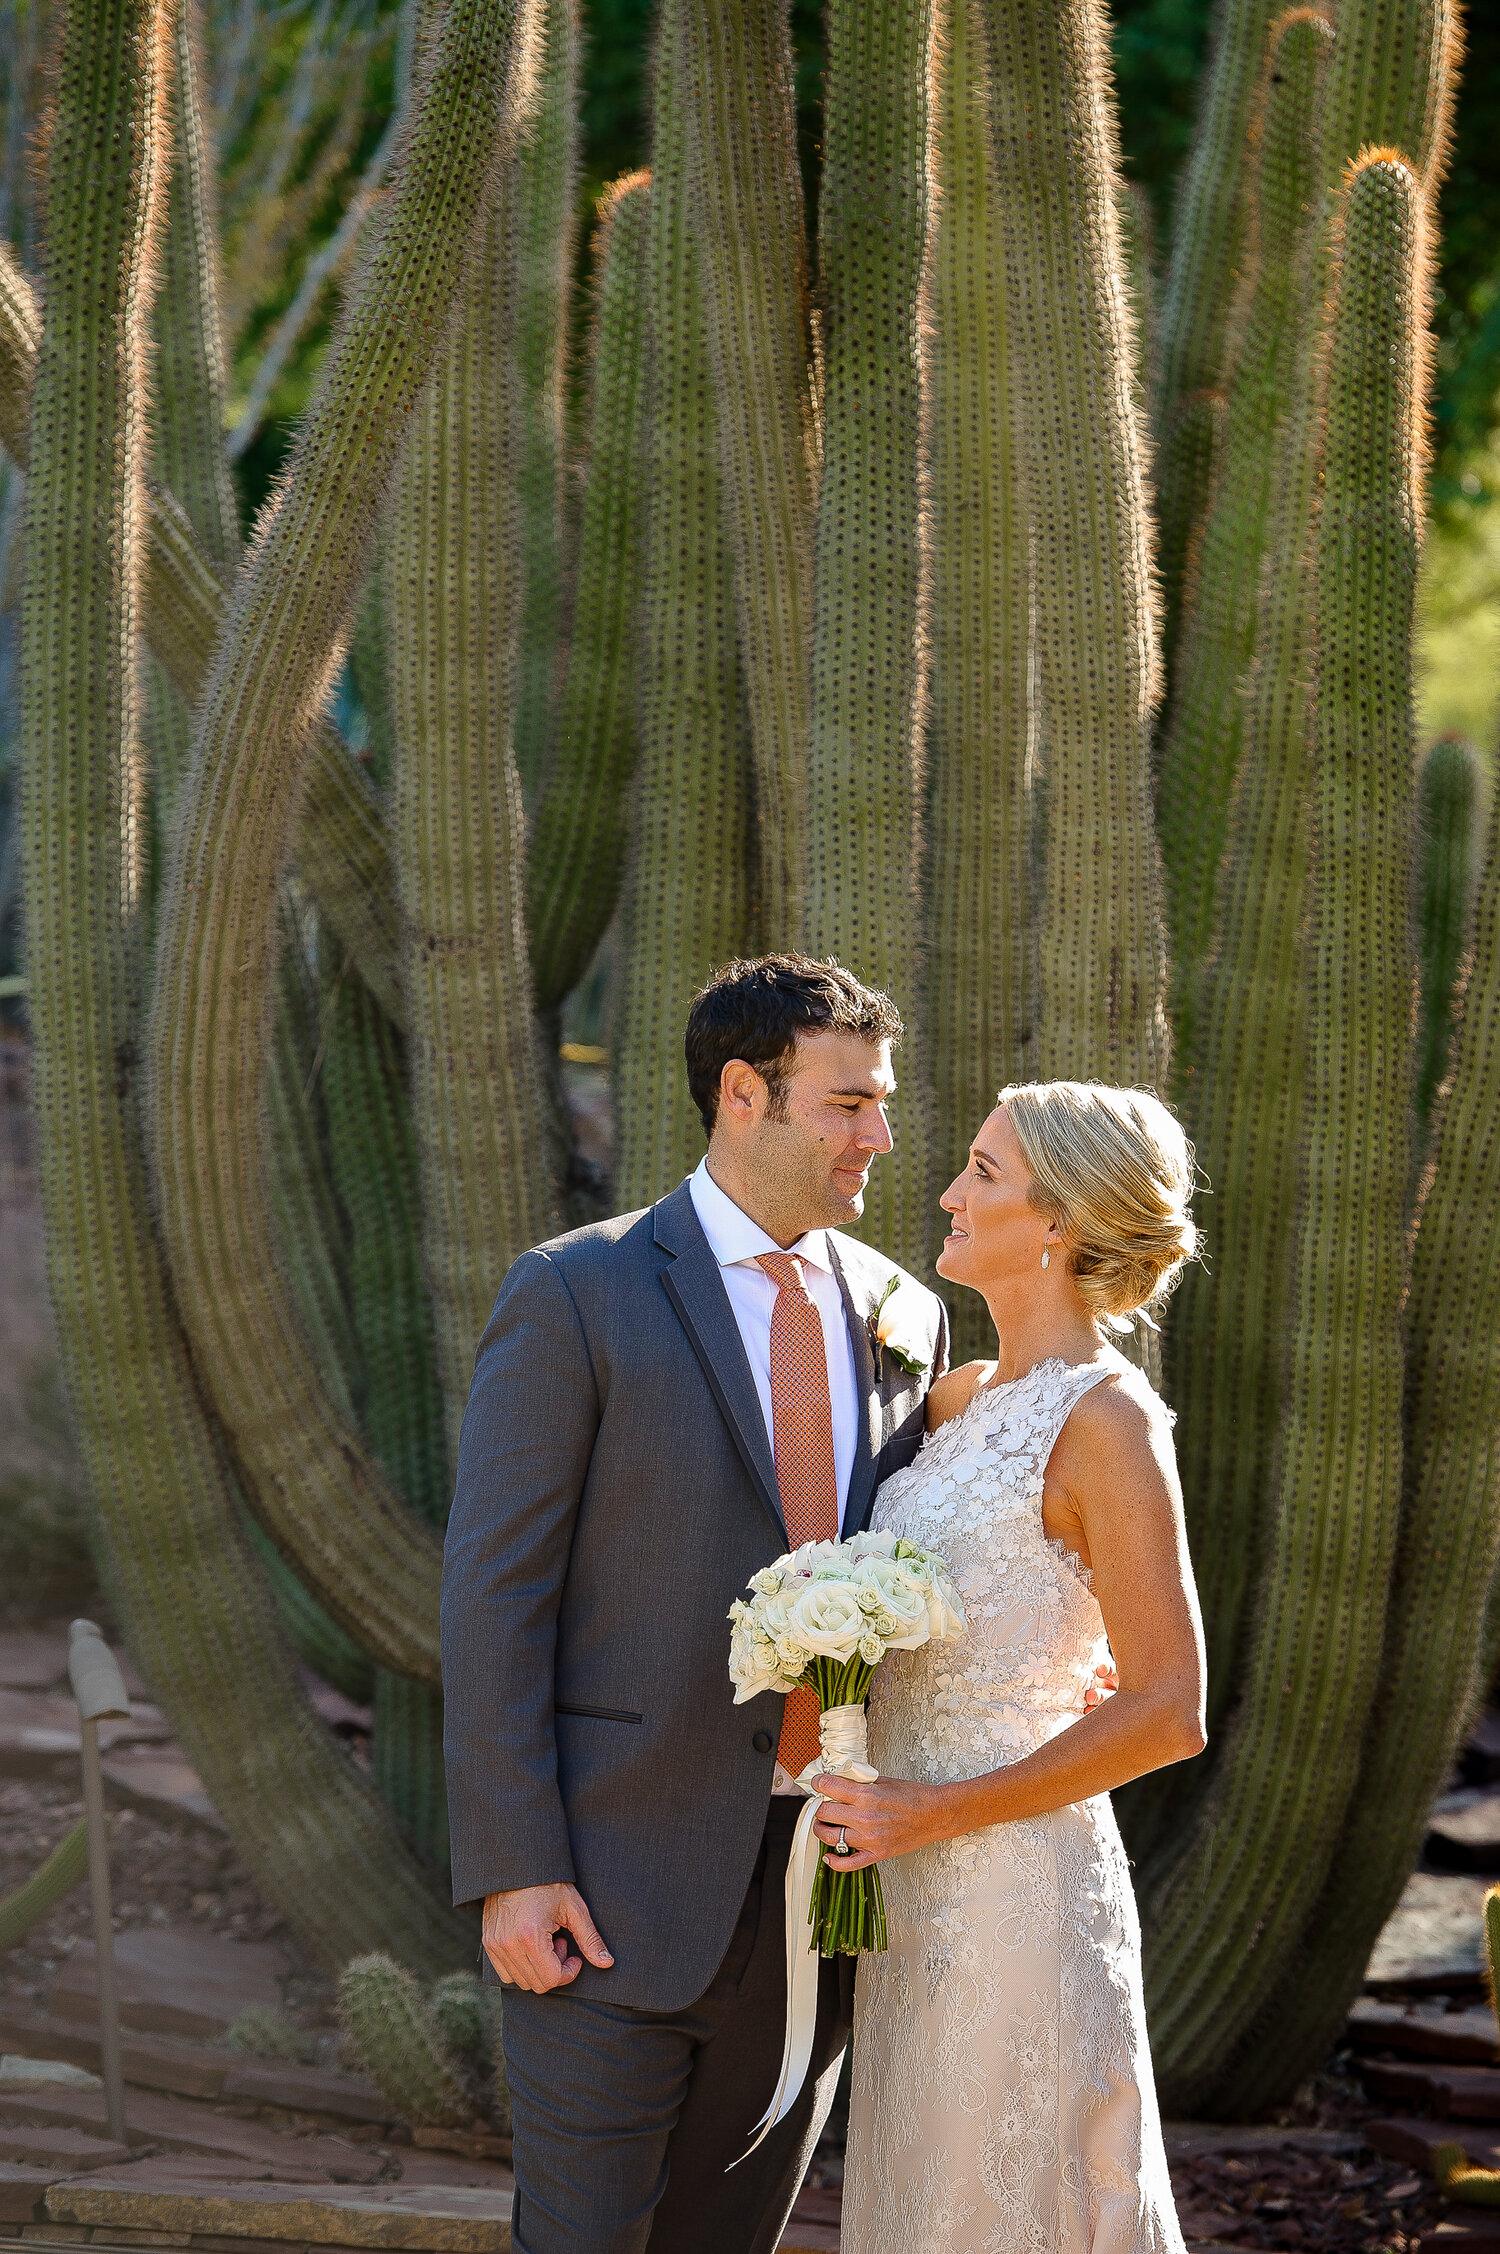 Winter Phoenix resort wedding18.jpg